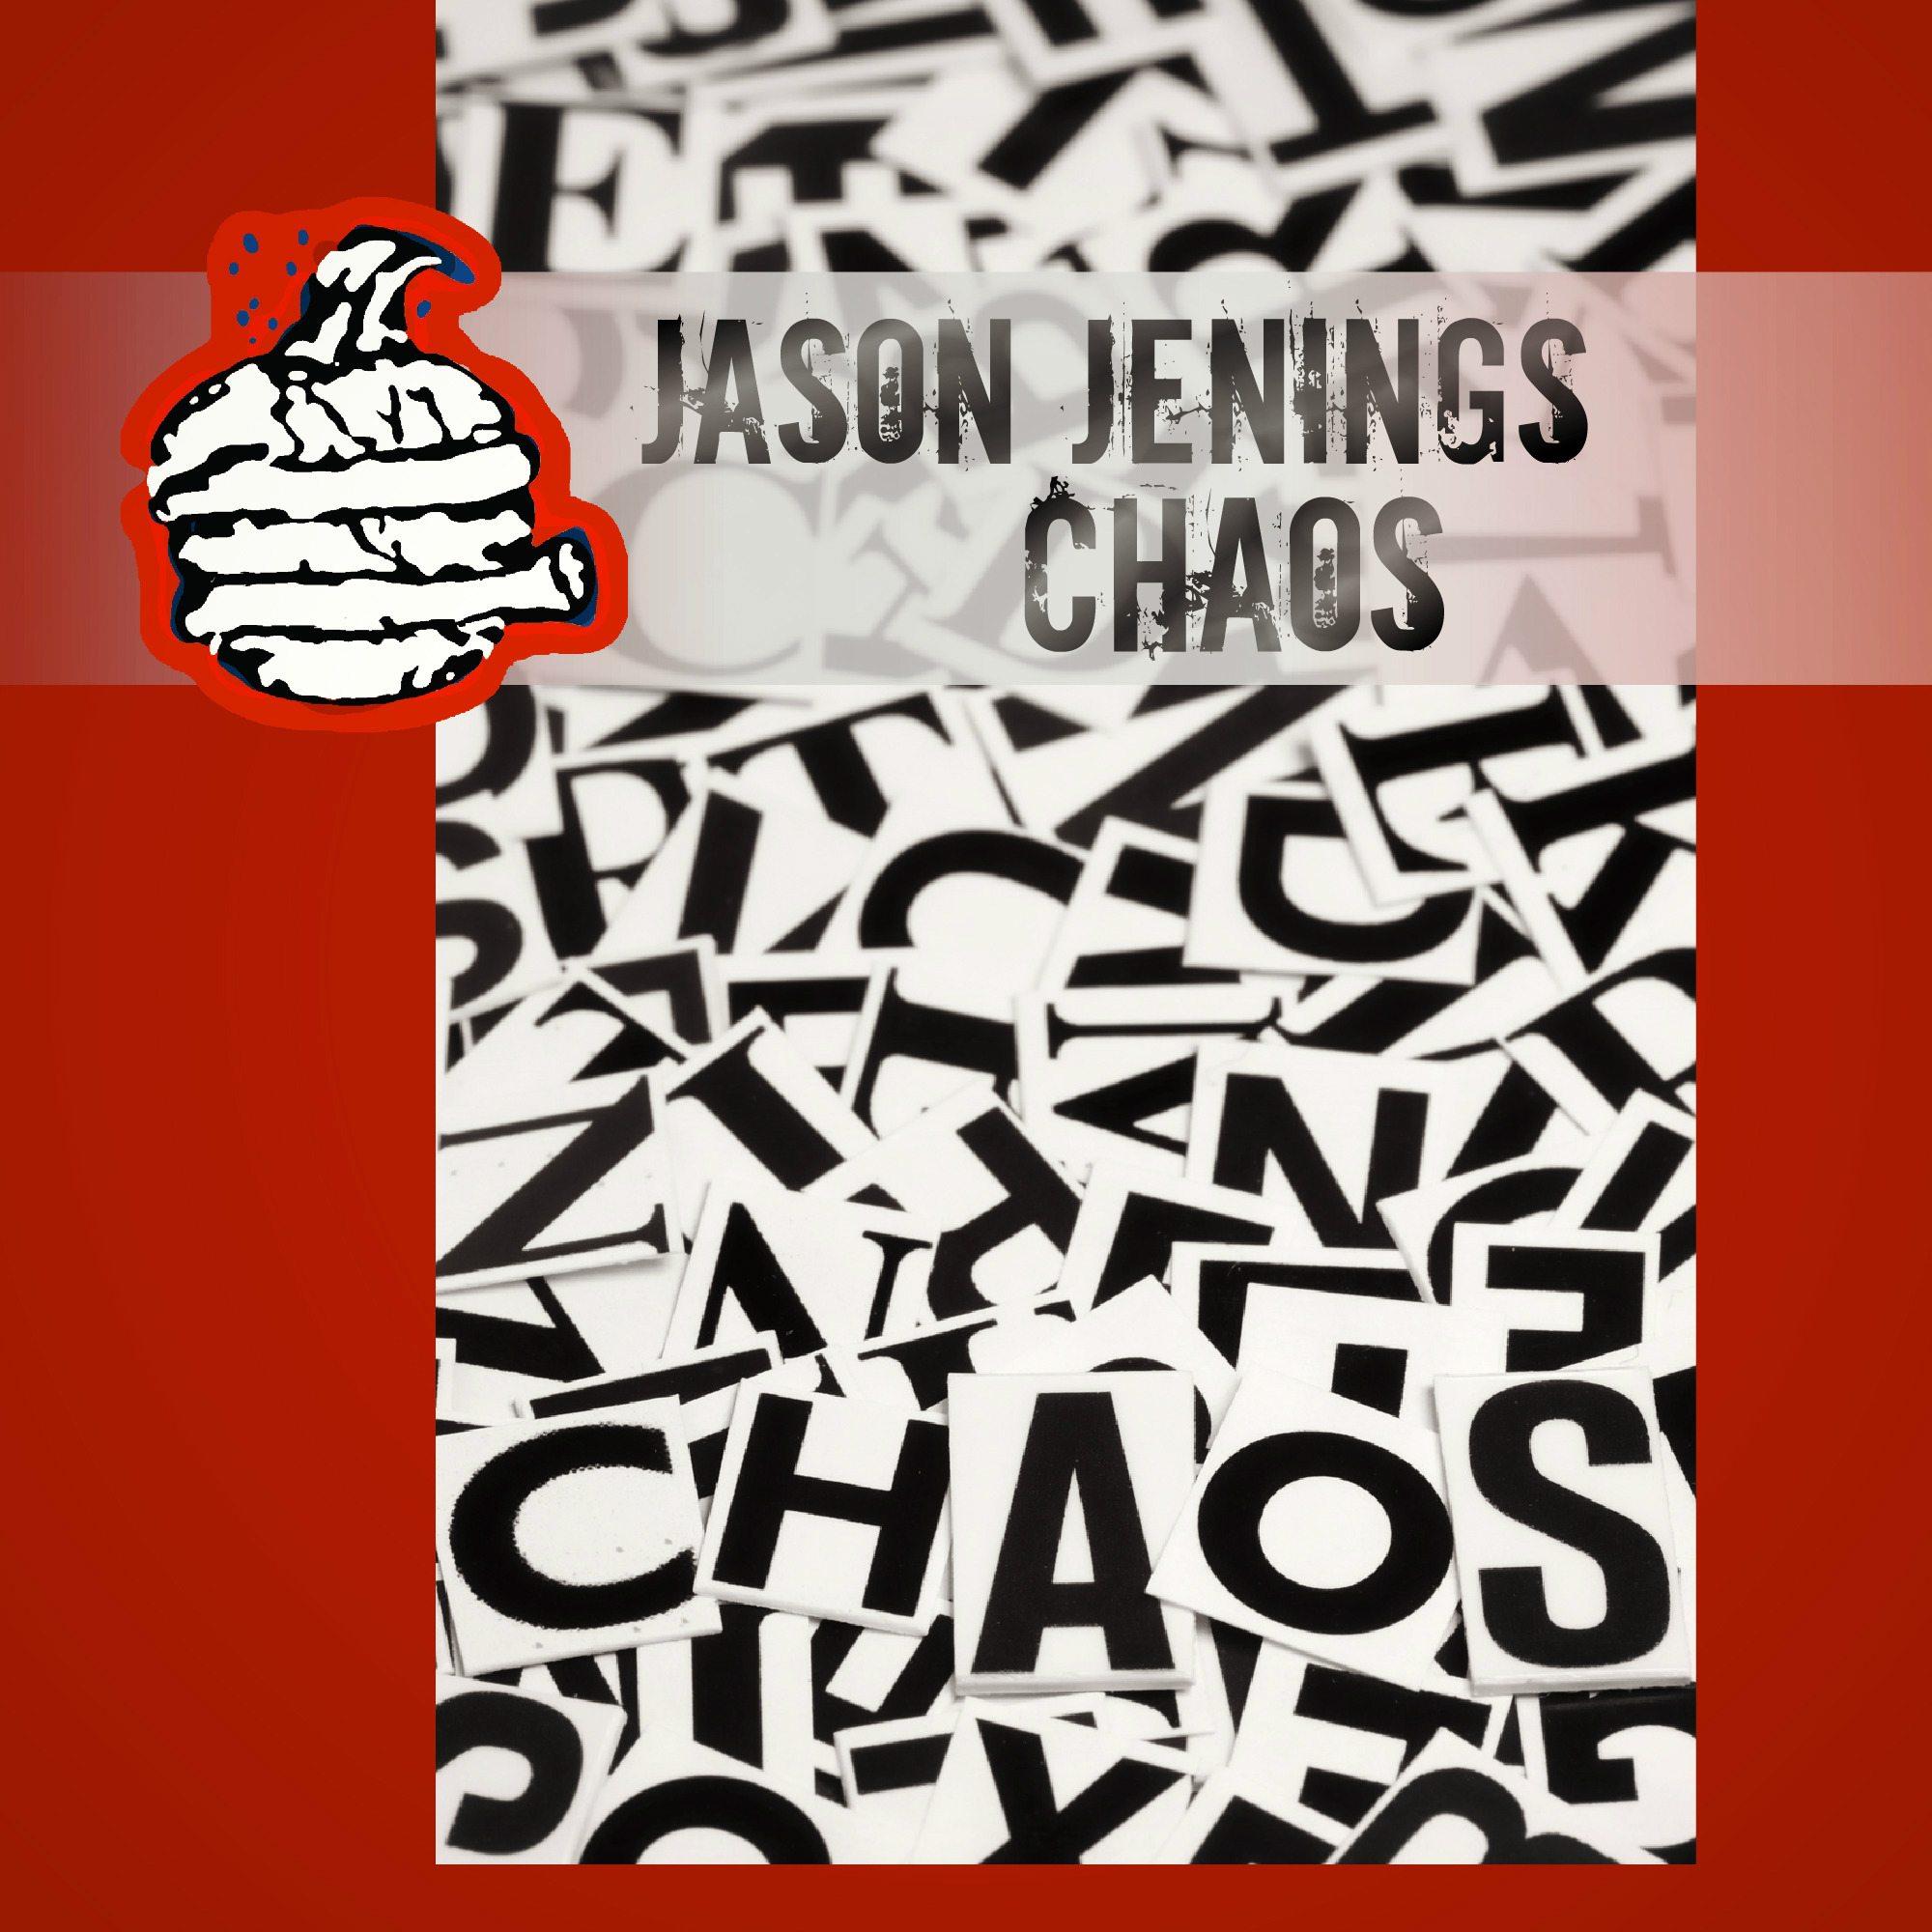 JASON JENINGS DROPS A BOMB ON HAMMARICA – CHAOS ENSUES!